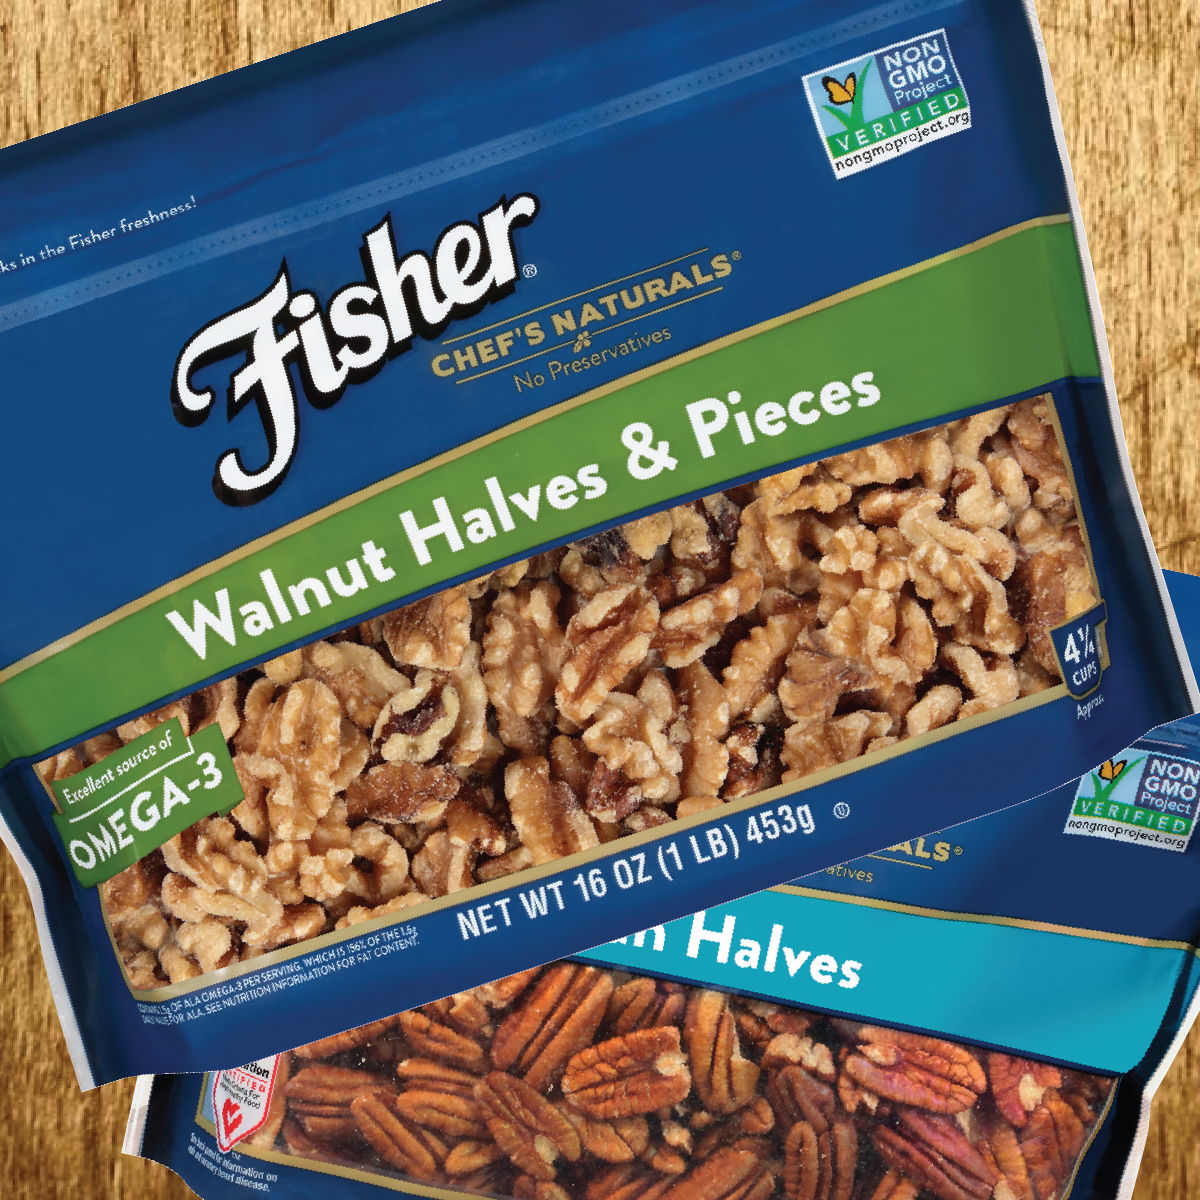 Fisher Chefs Naturals